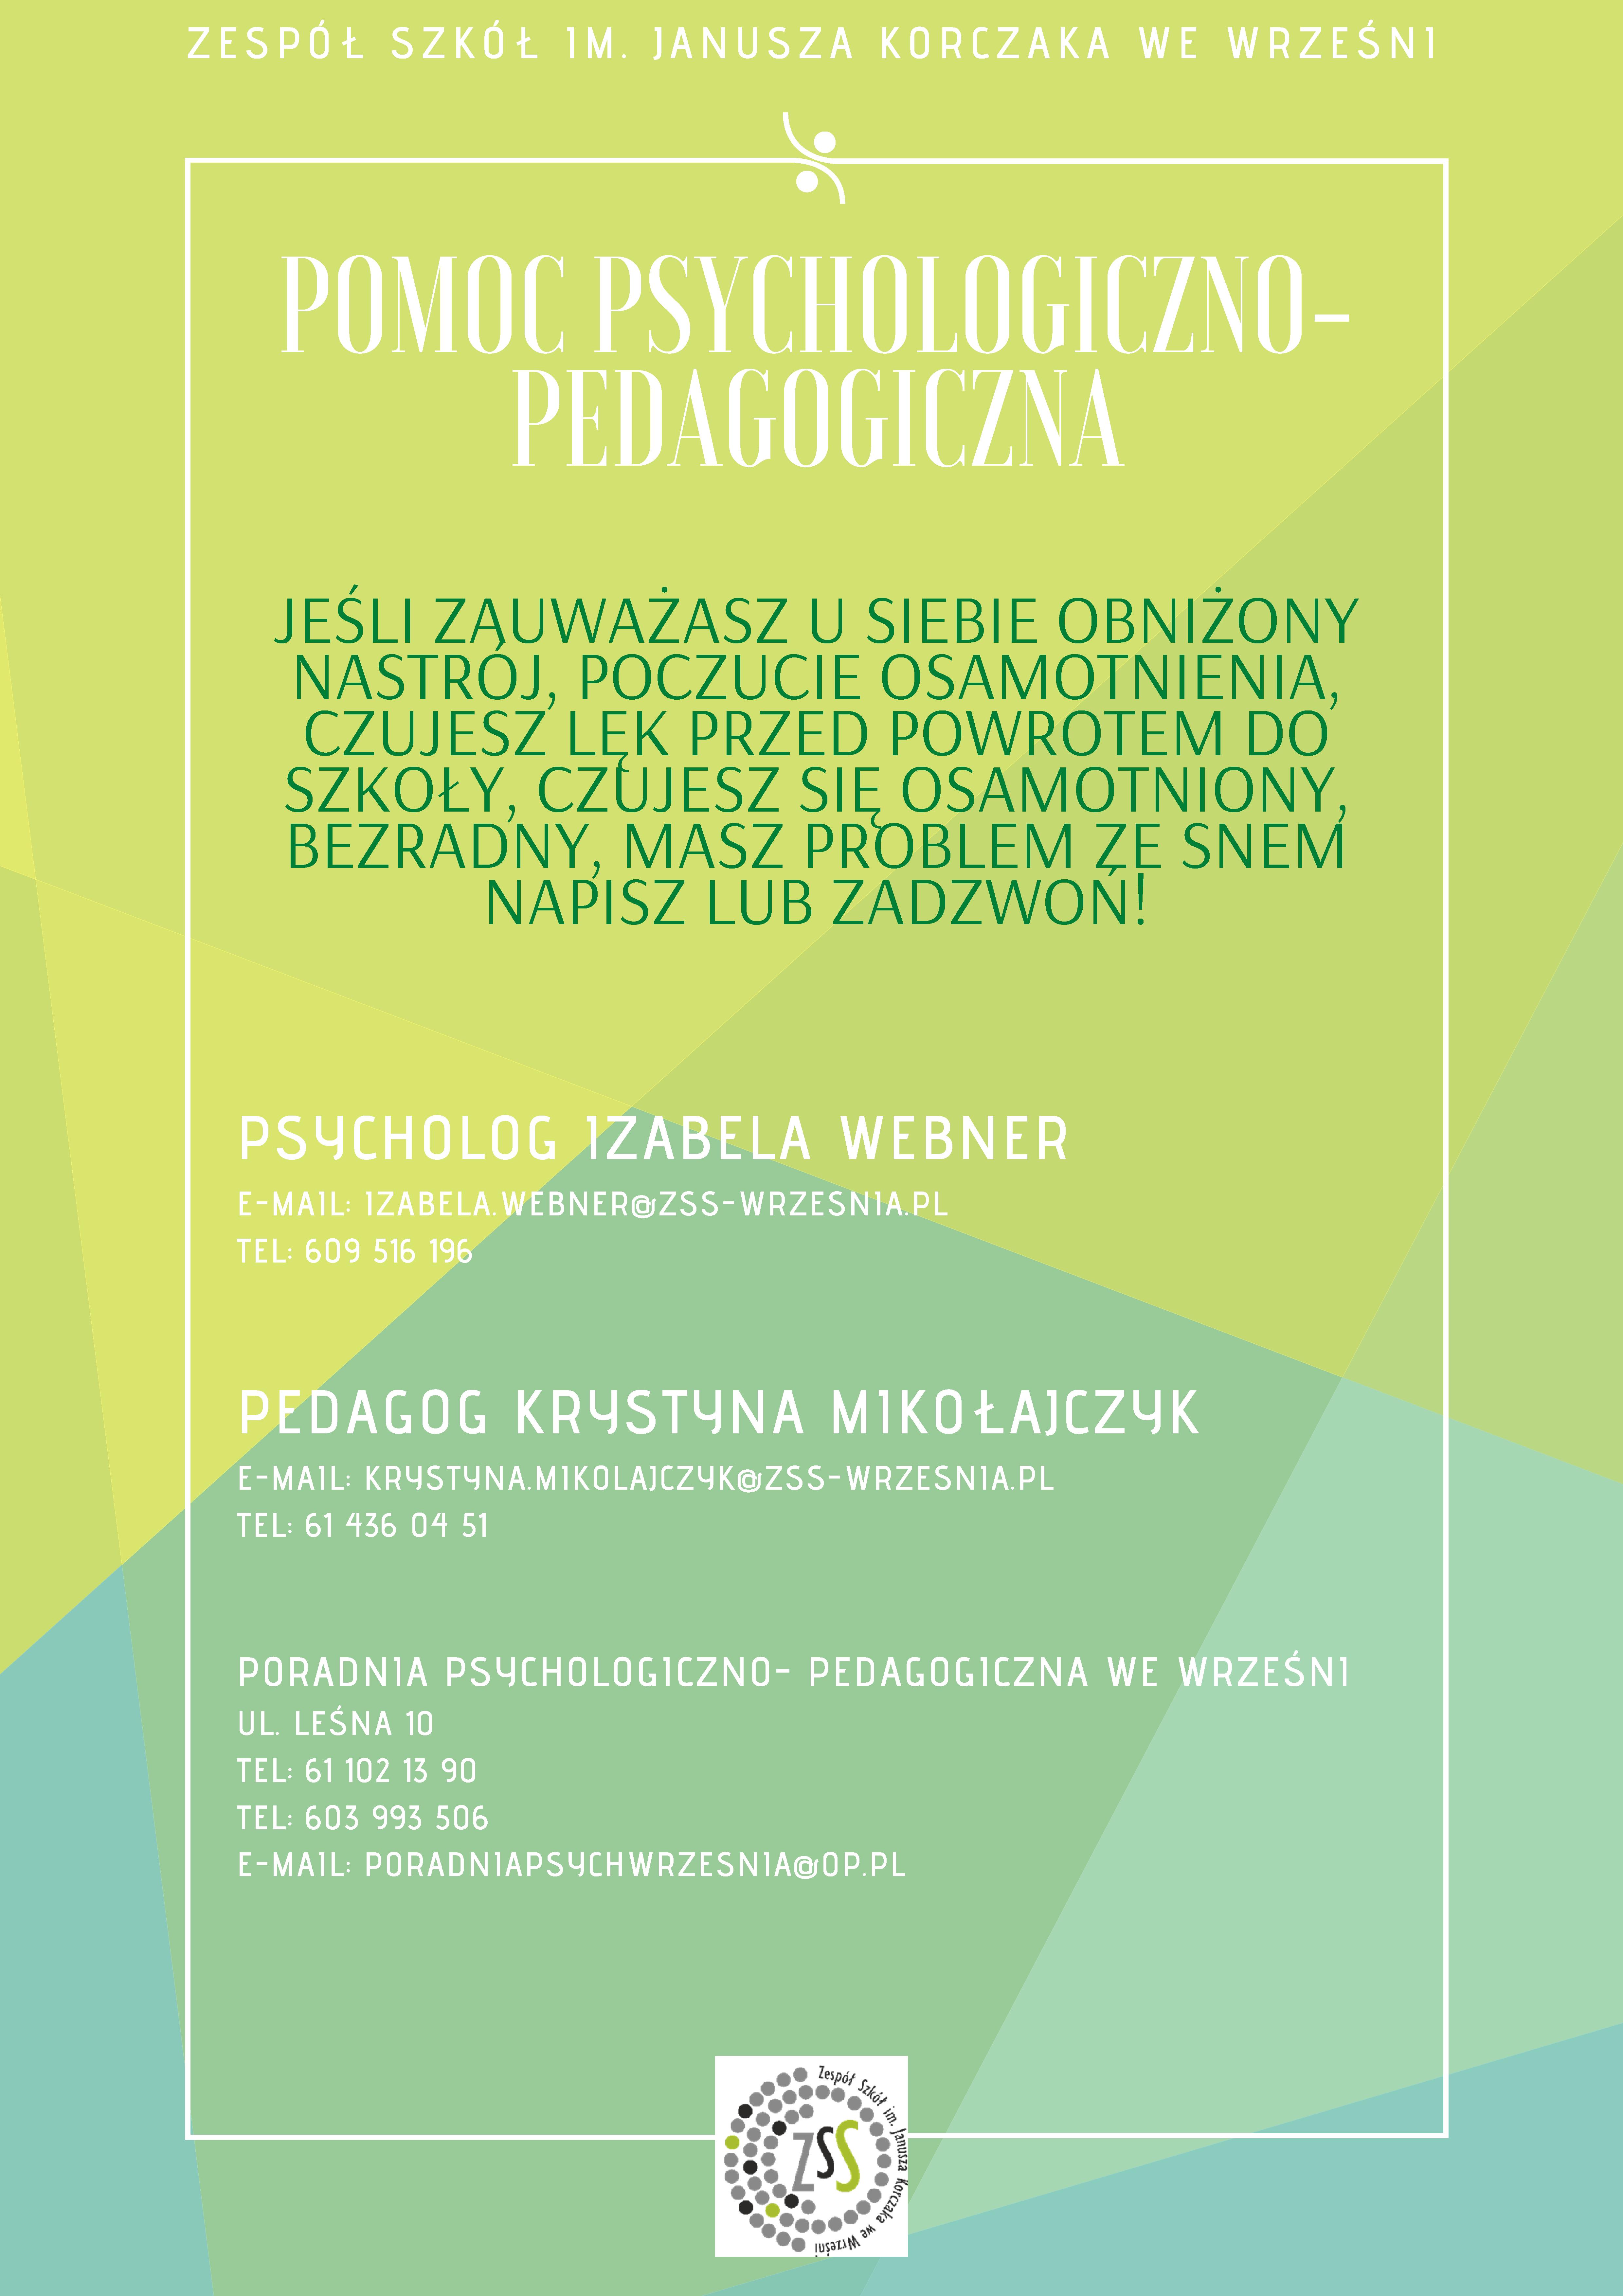 Plakat pomoc psychologiczno-pedagogiczna